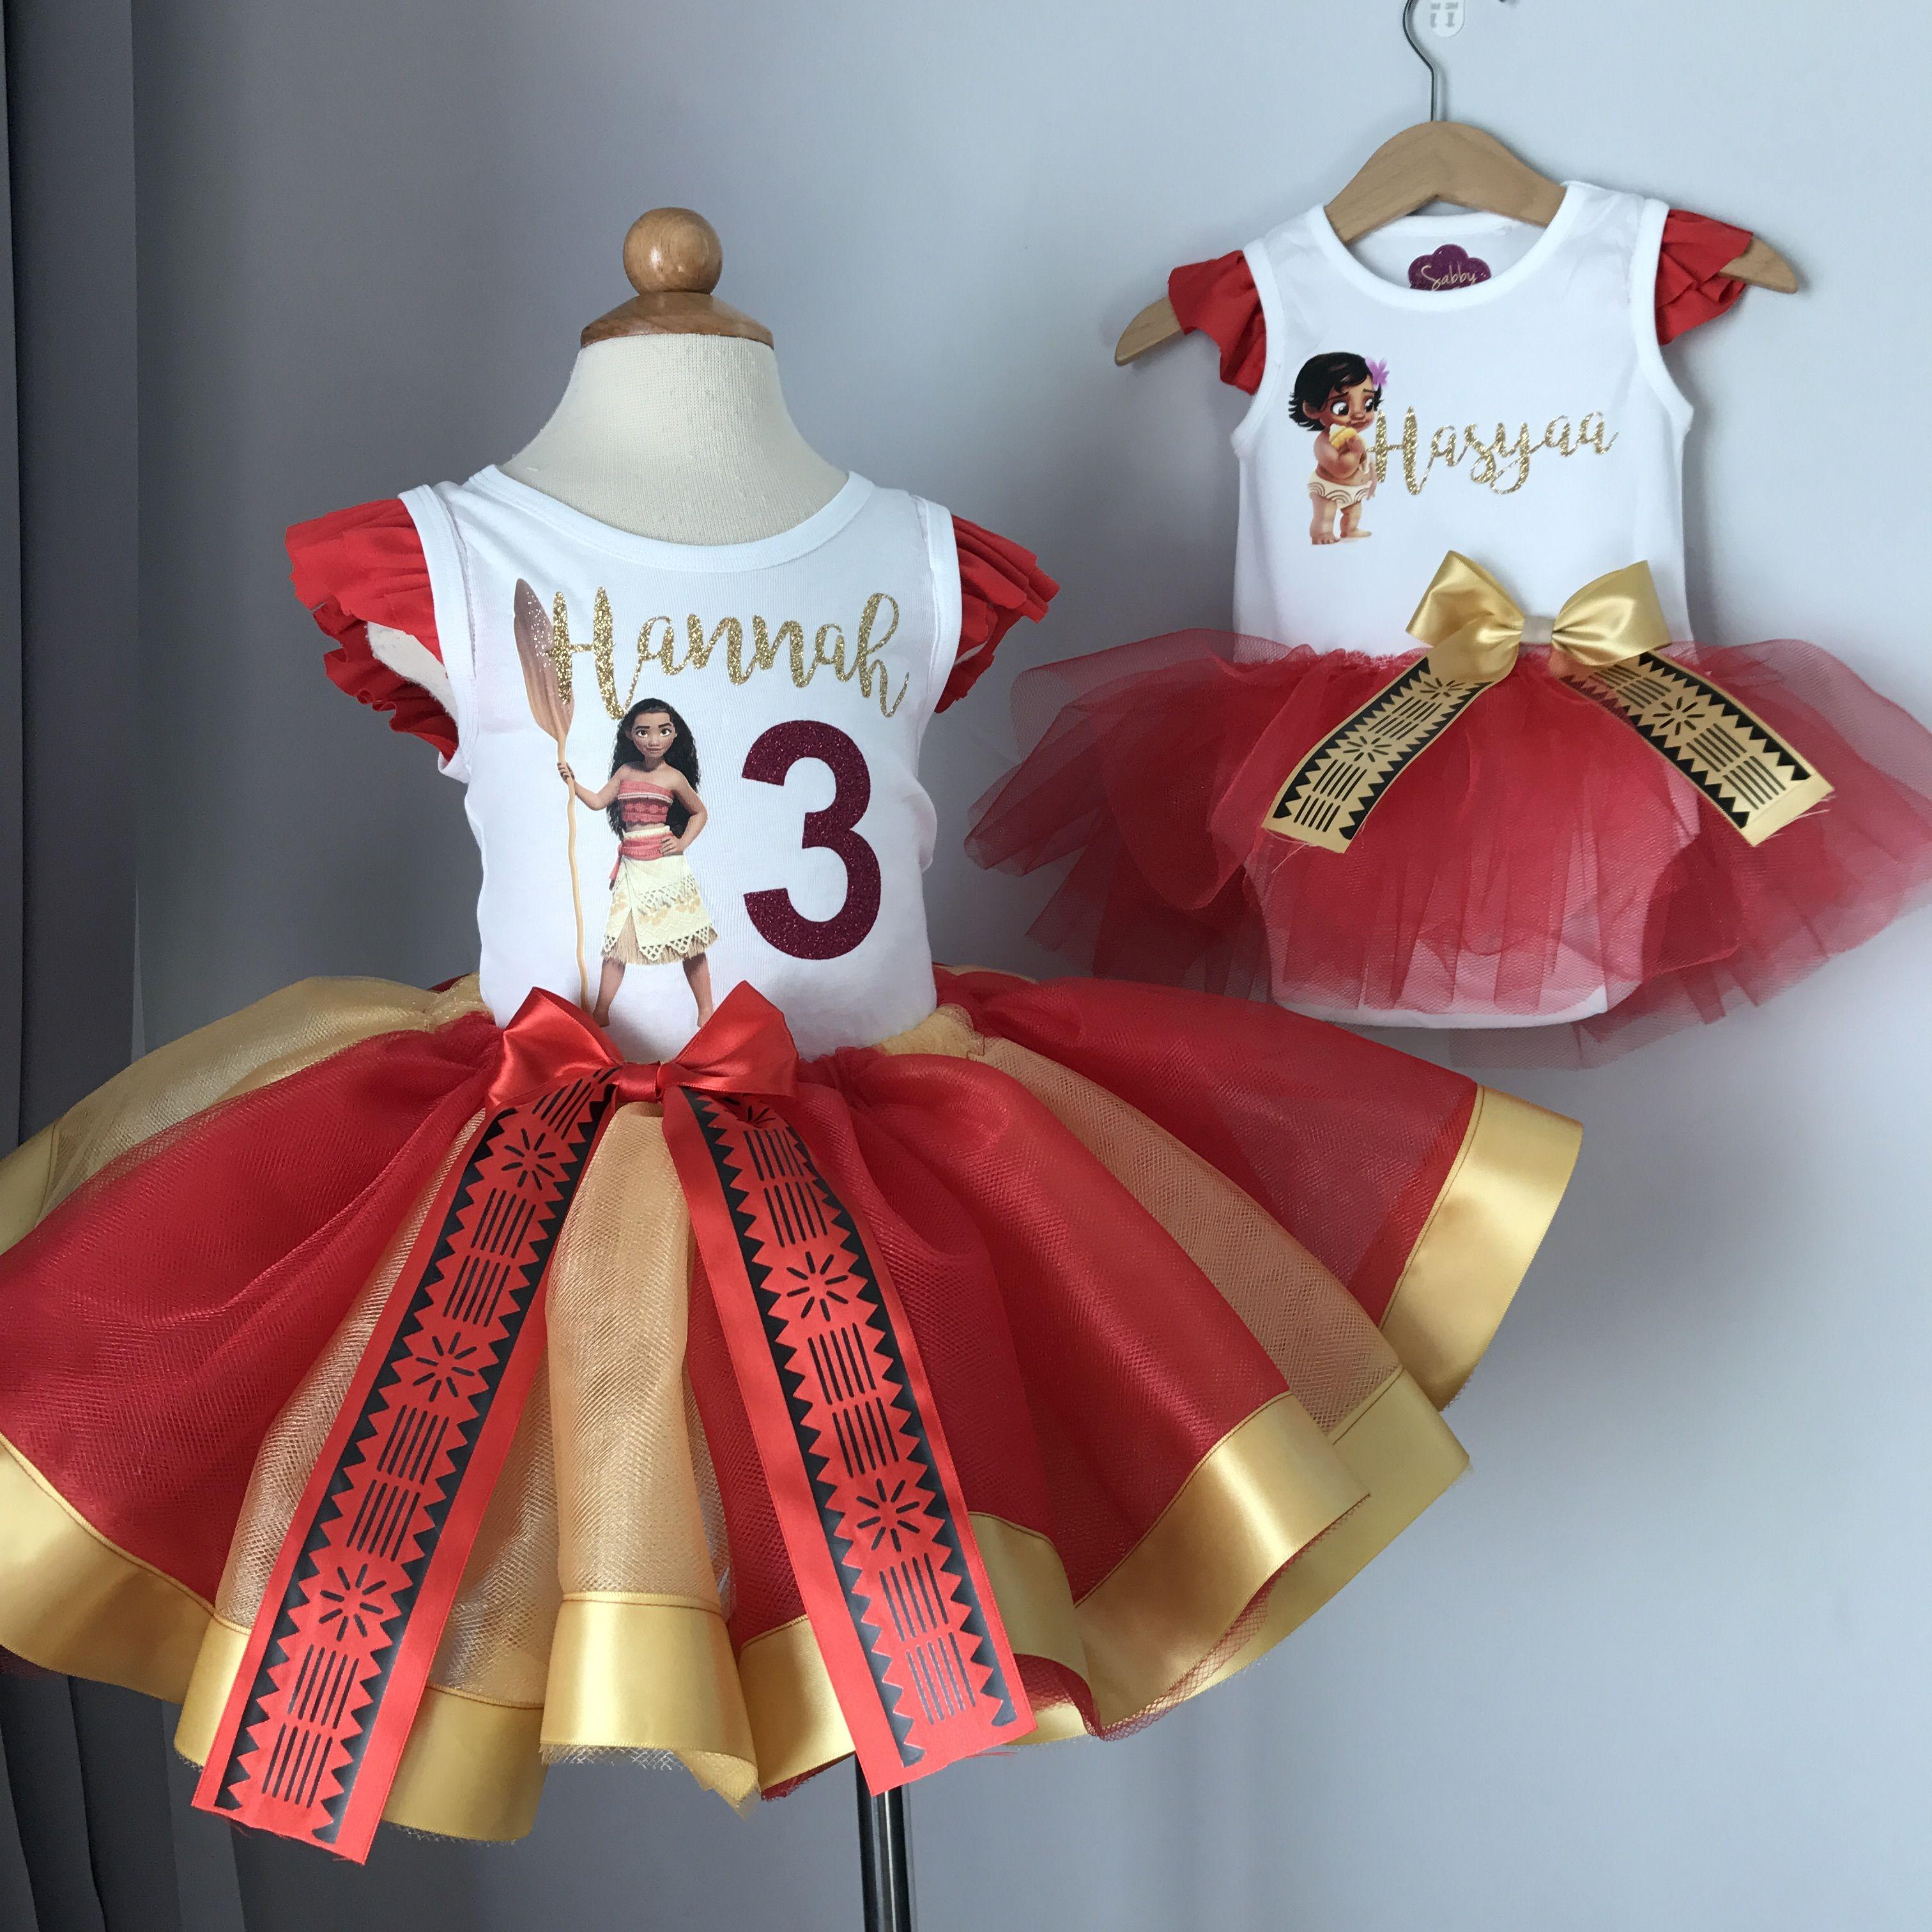 Moana Tutu Moana Costume Moana Dress Moana Tutu Set Moana Tutu Dress Moana Tutu Outfit Moana Birthday Dress Moana Birthday Outfit